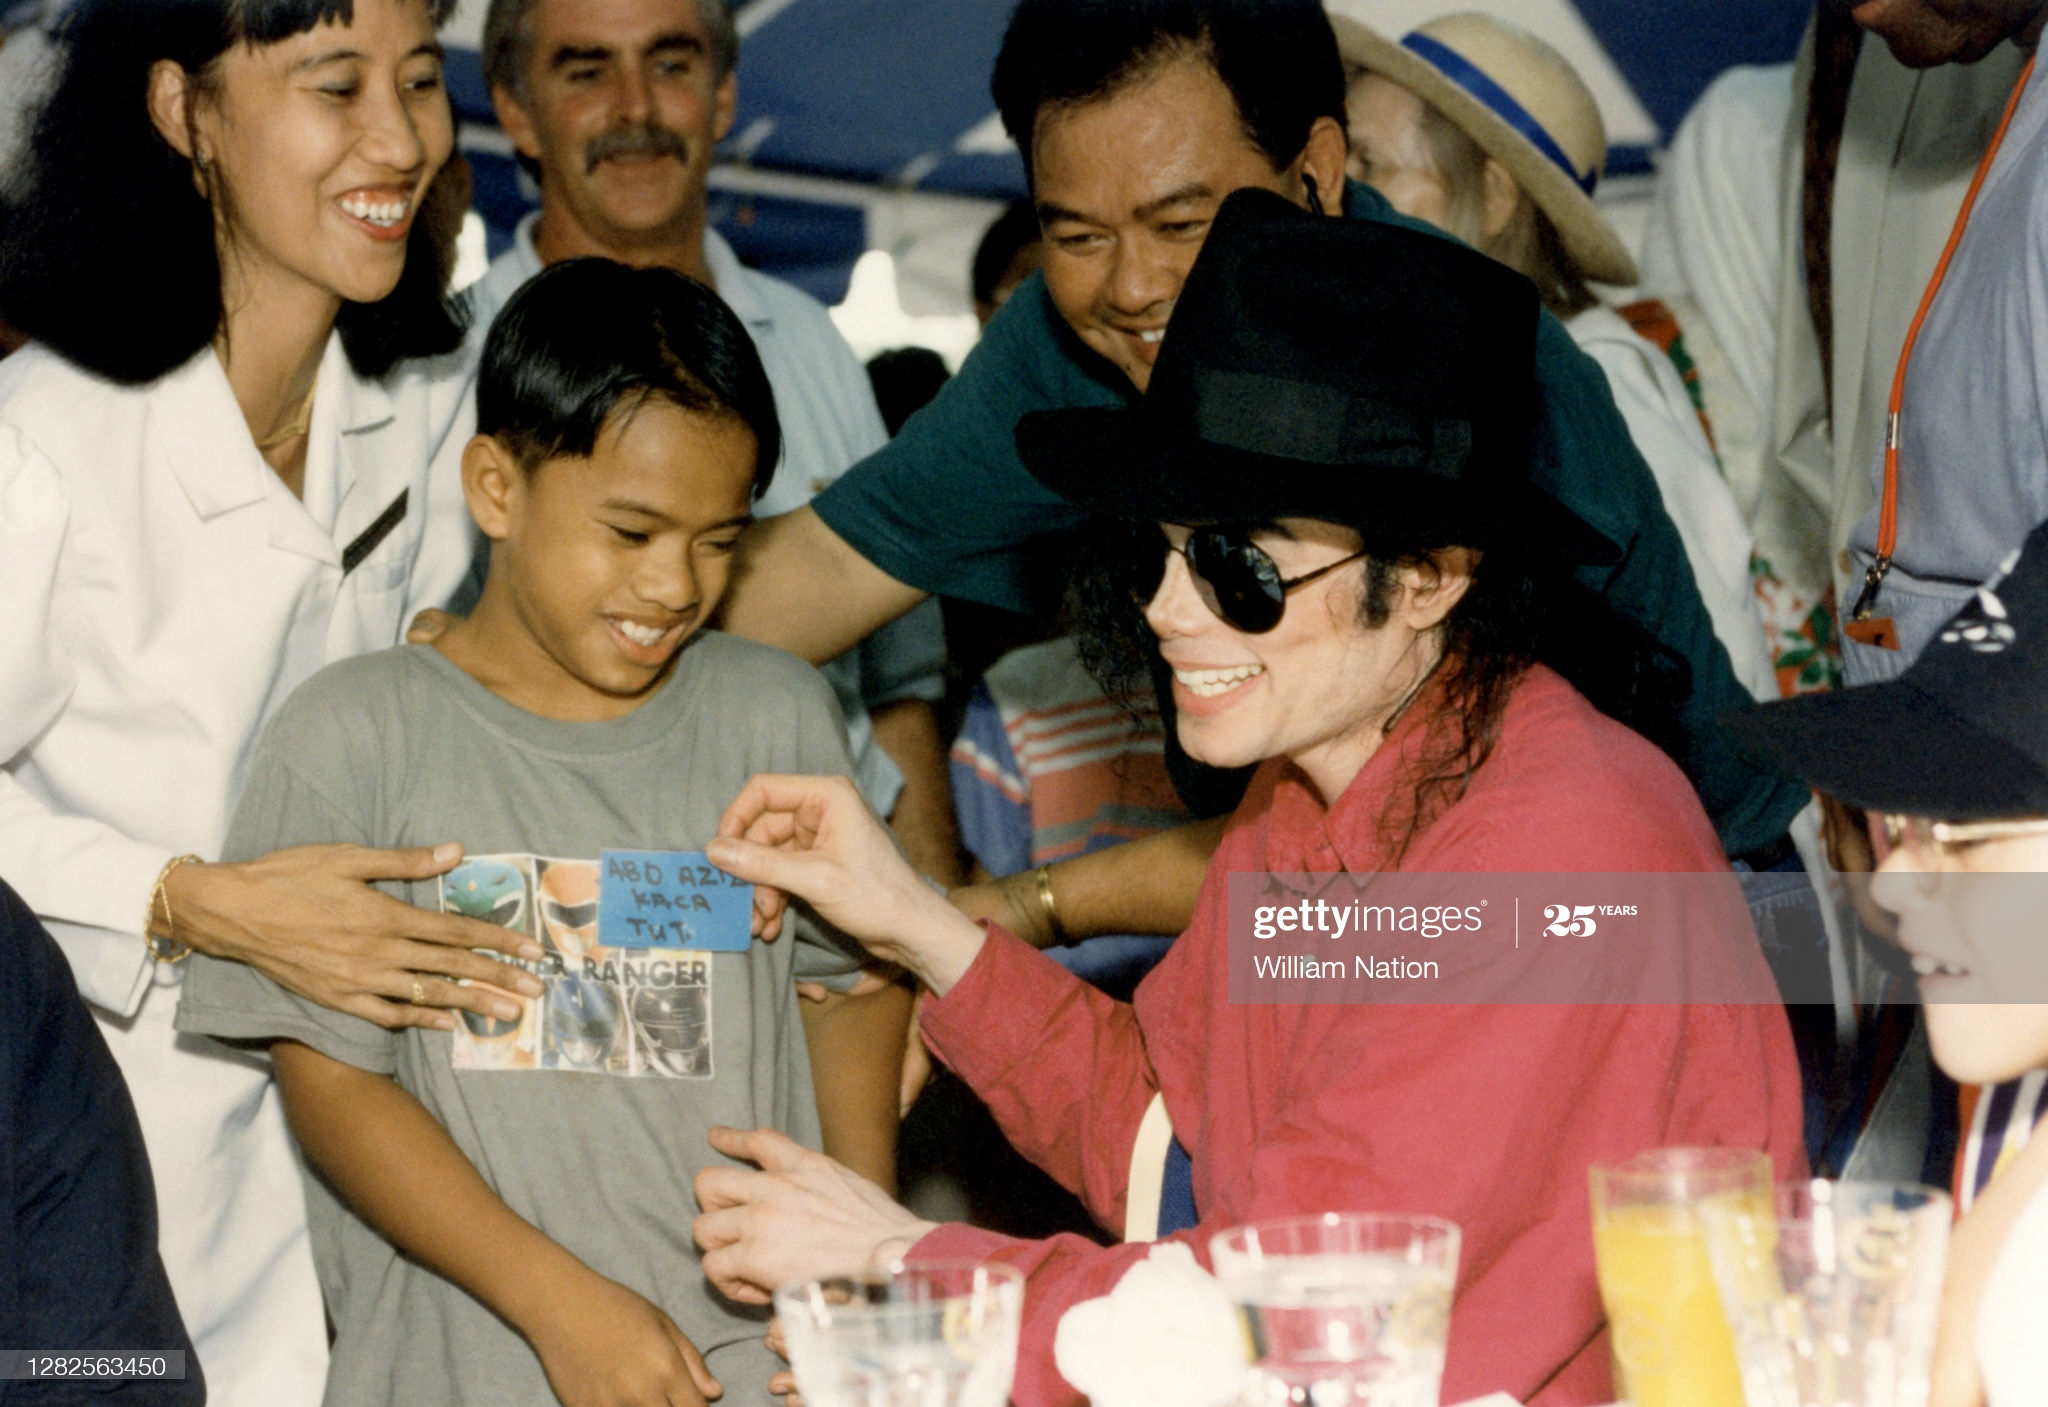 BANDAR-SERI-BEGAWAN-BRUNEI-JULY-1996-American-singer-songwriter-and-dancer-Michael-Jackson-1958-2009.jpg